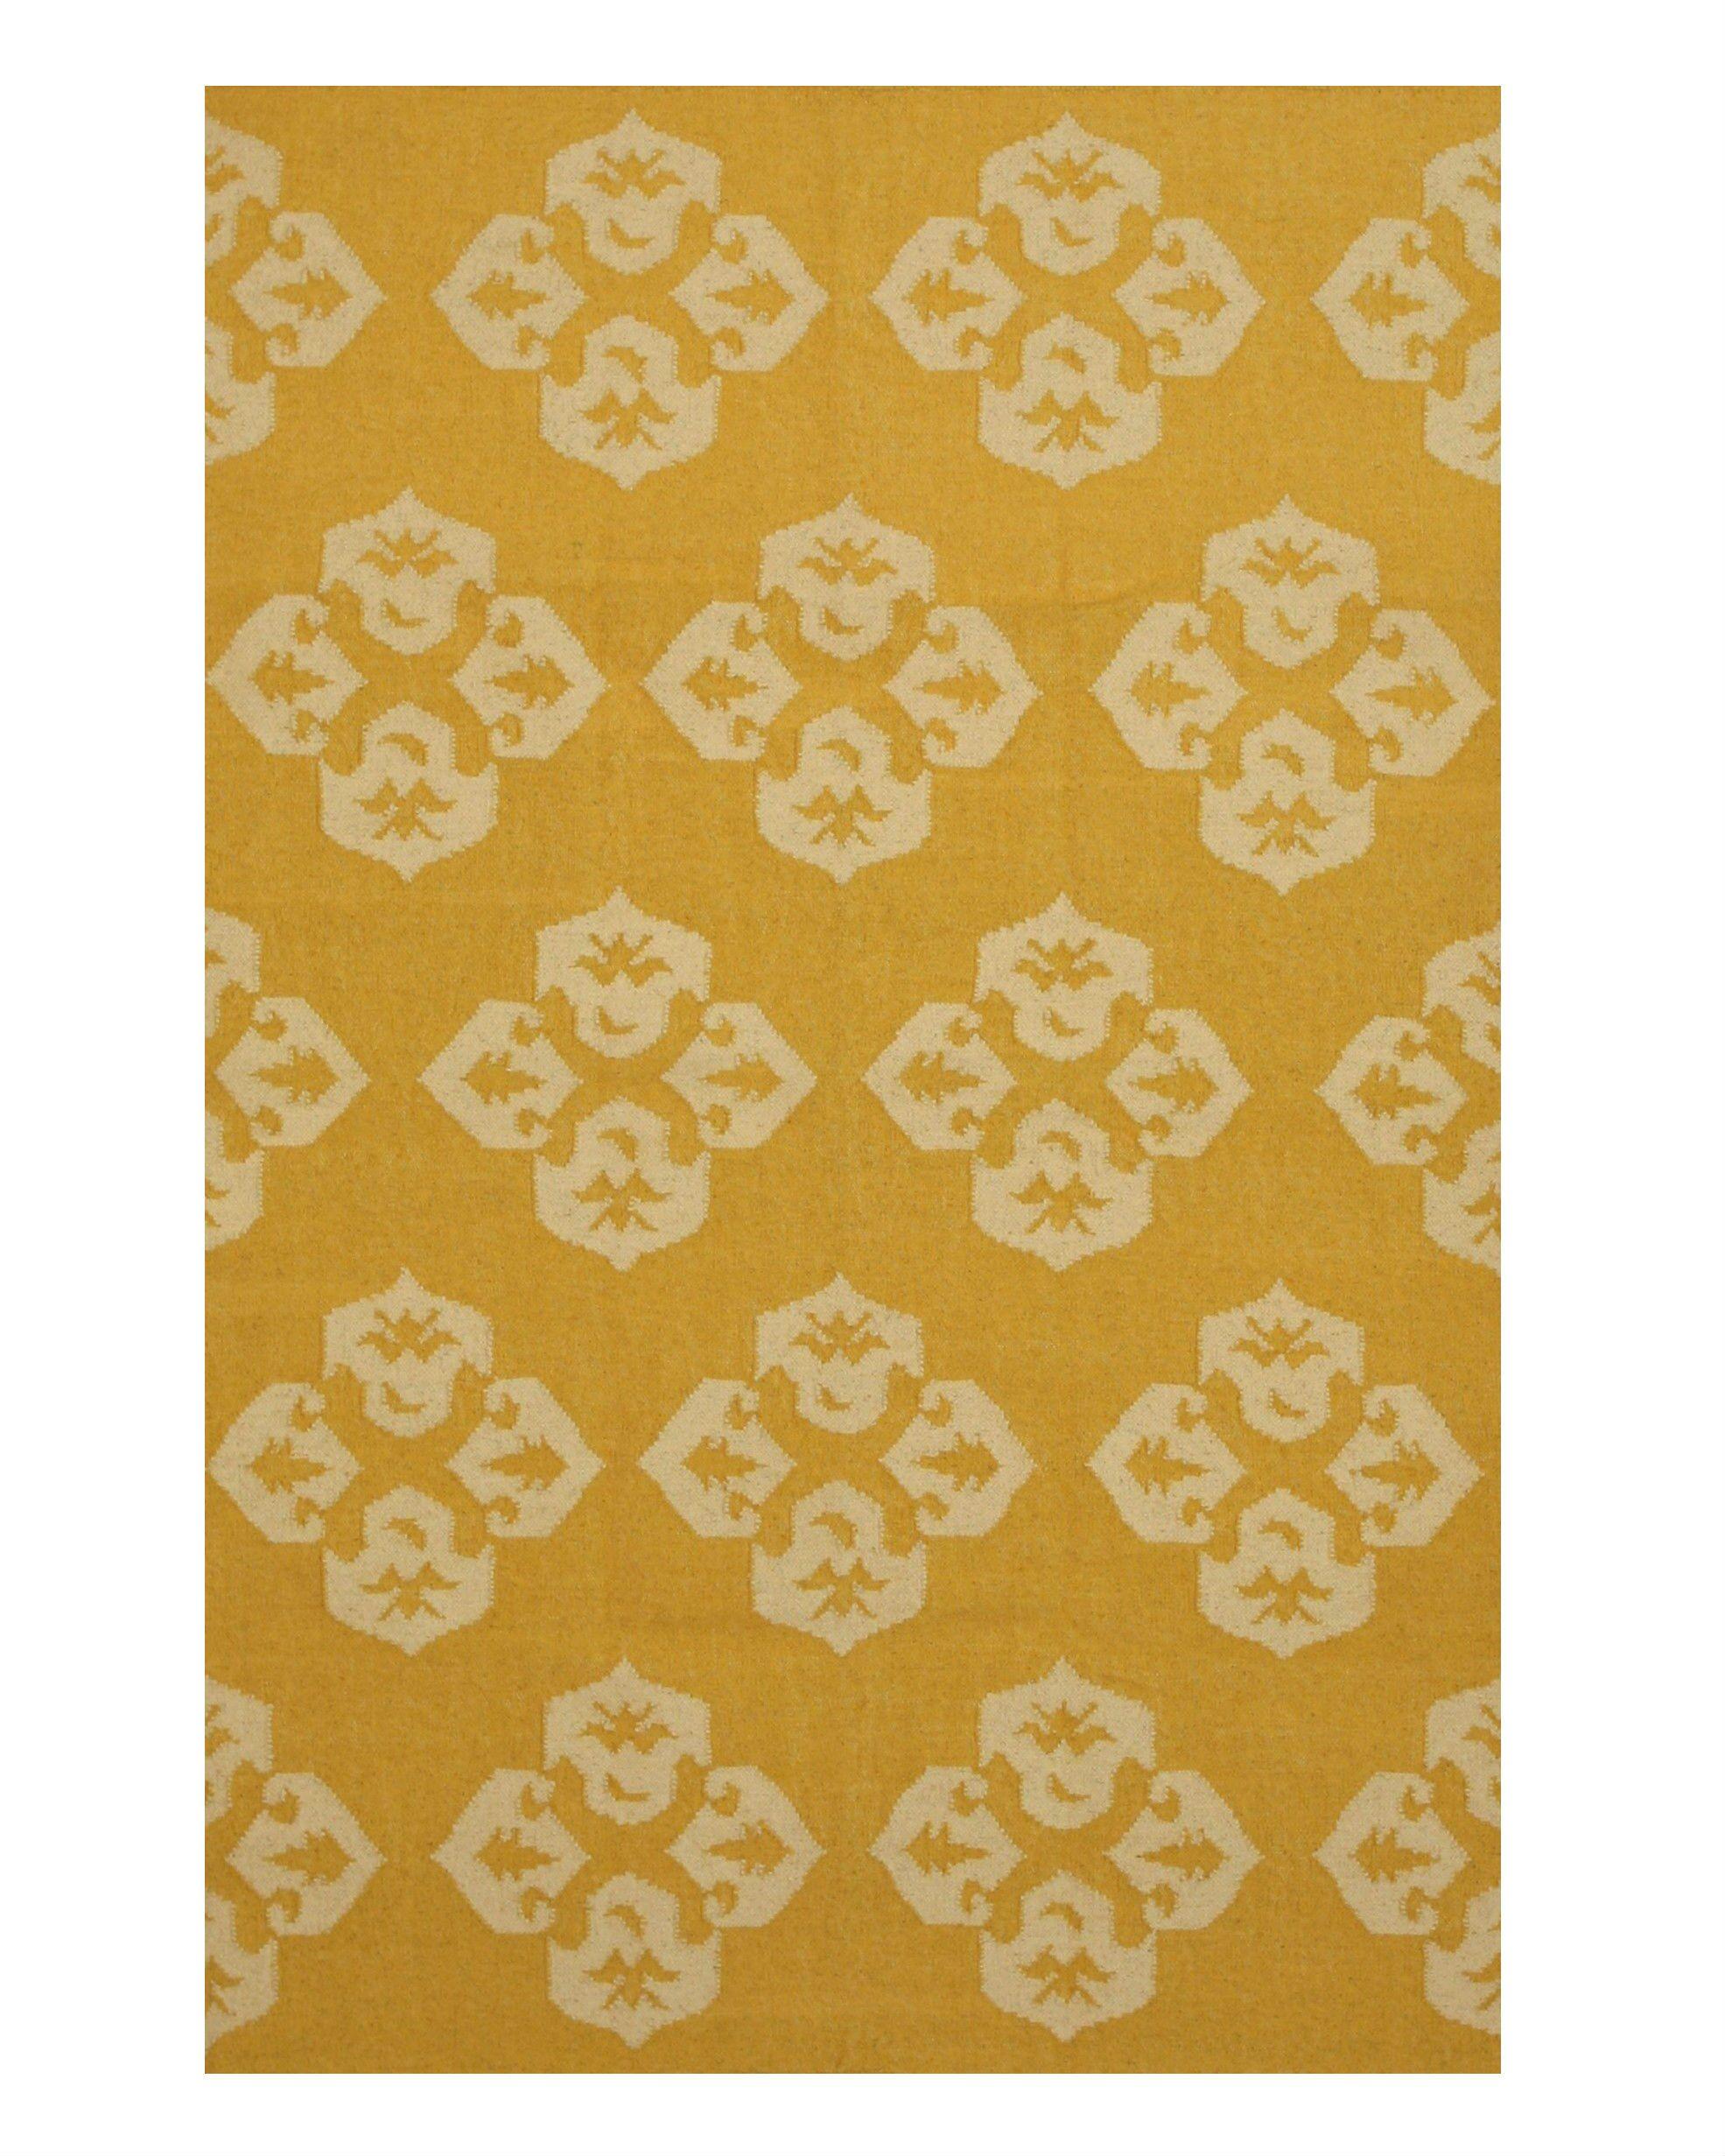 Handmade Gold Area Rug Size: Rectangle 9' x 12'